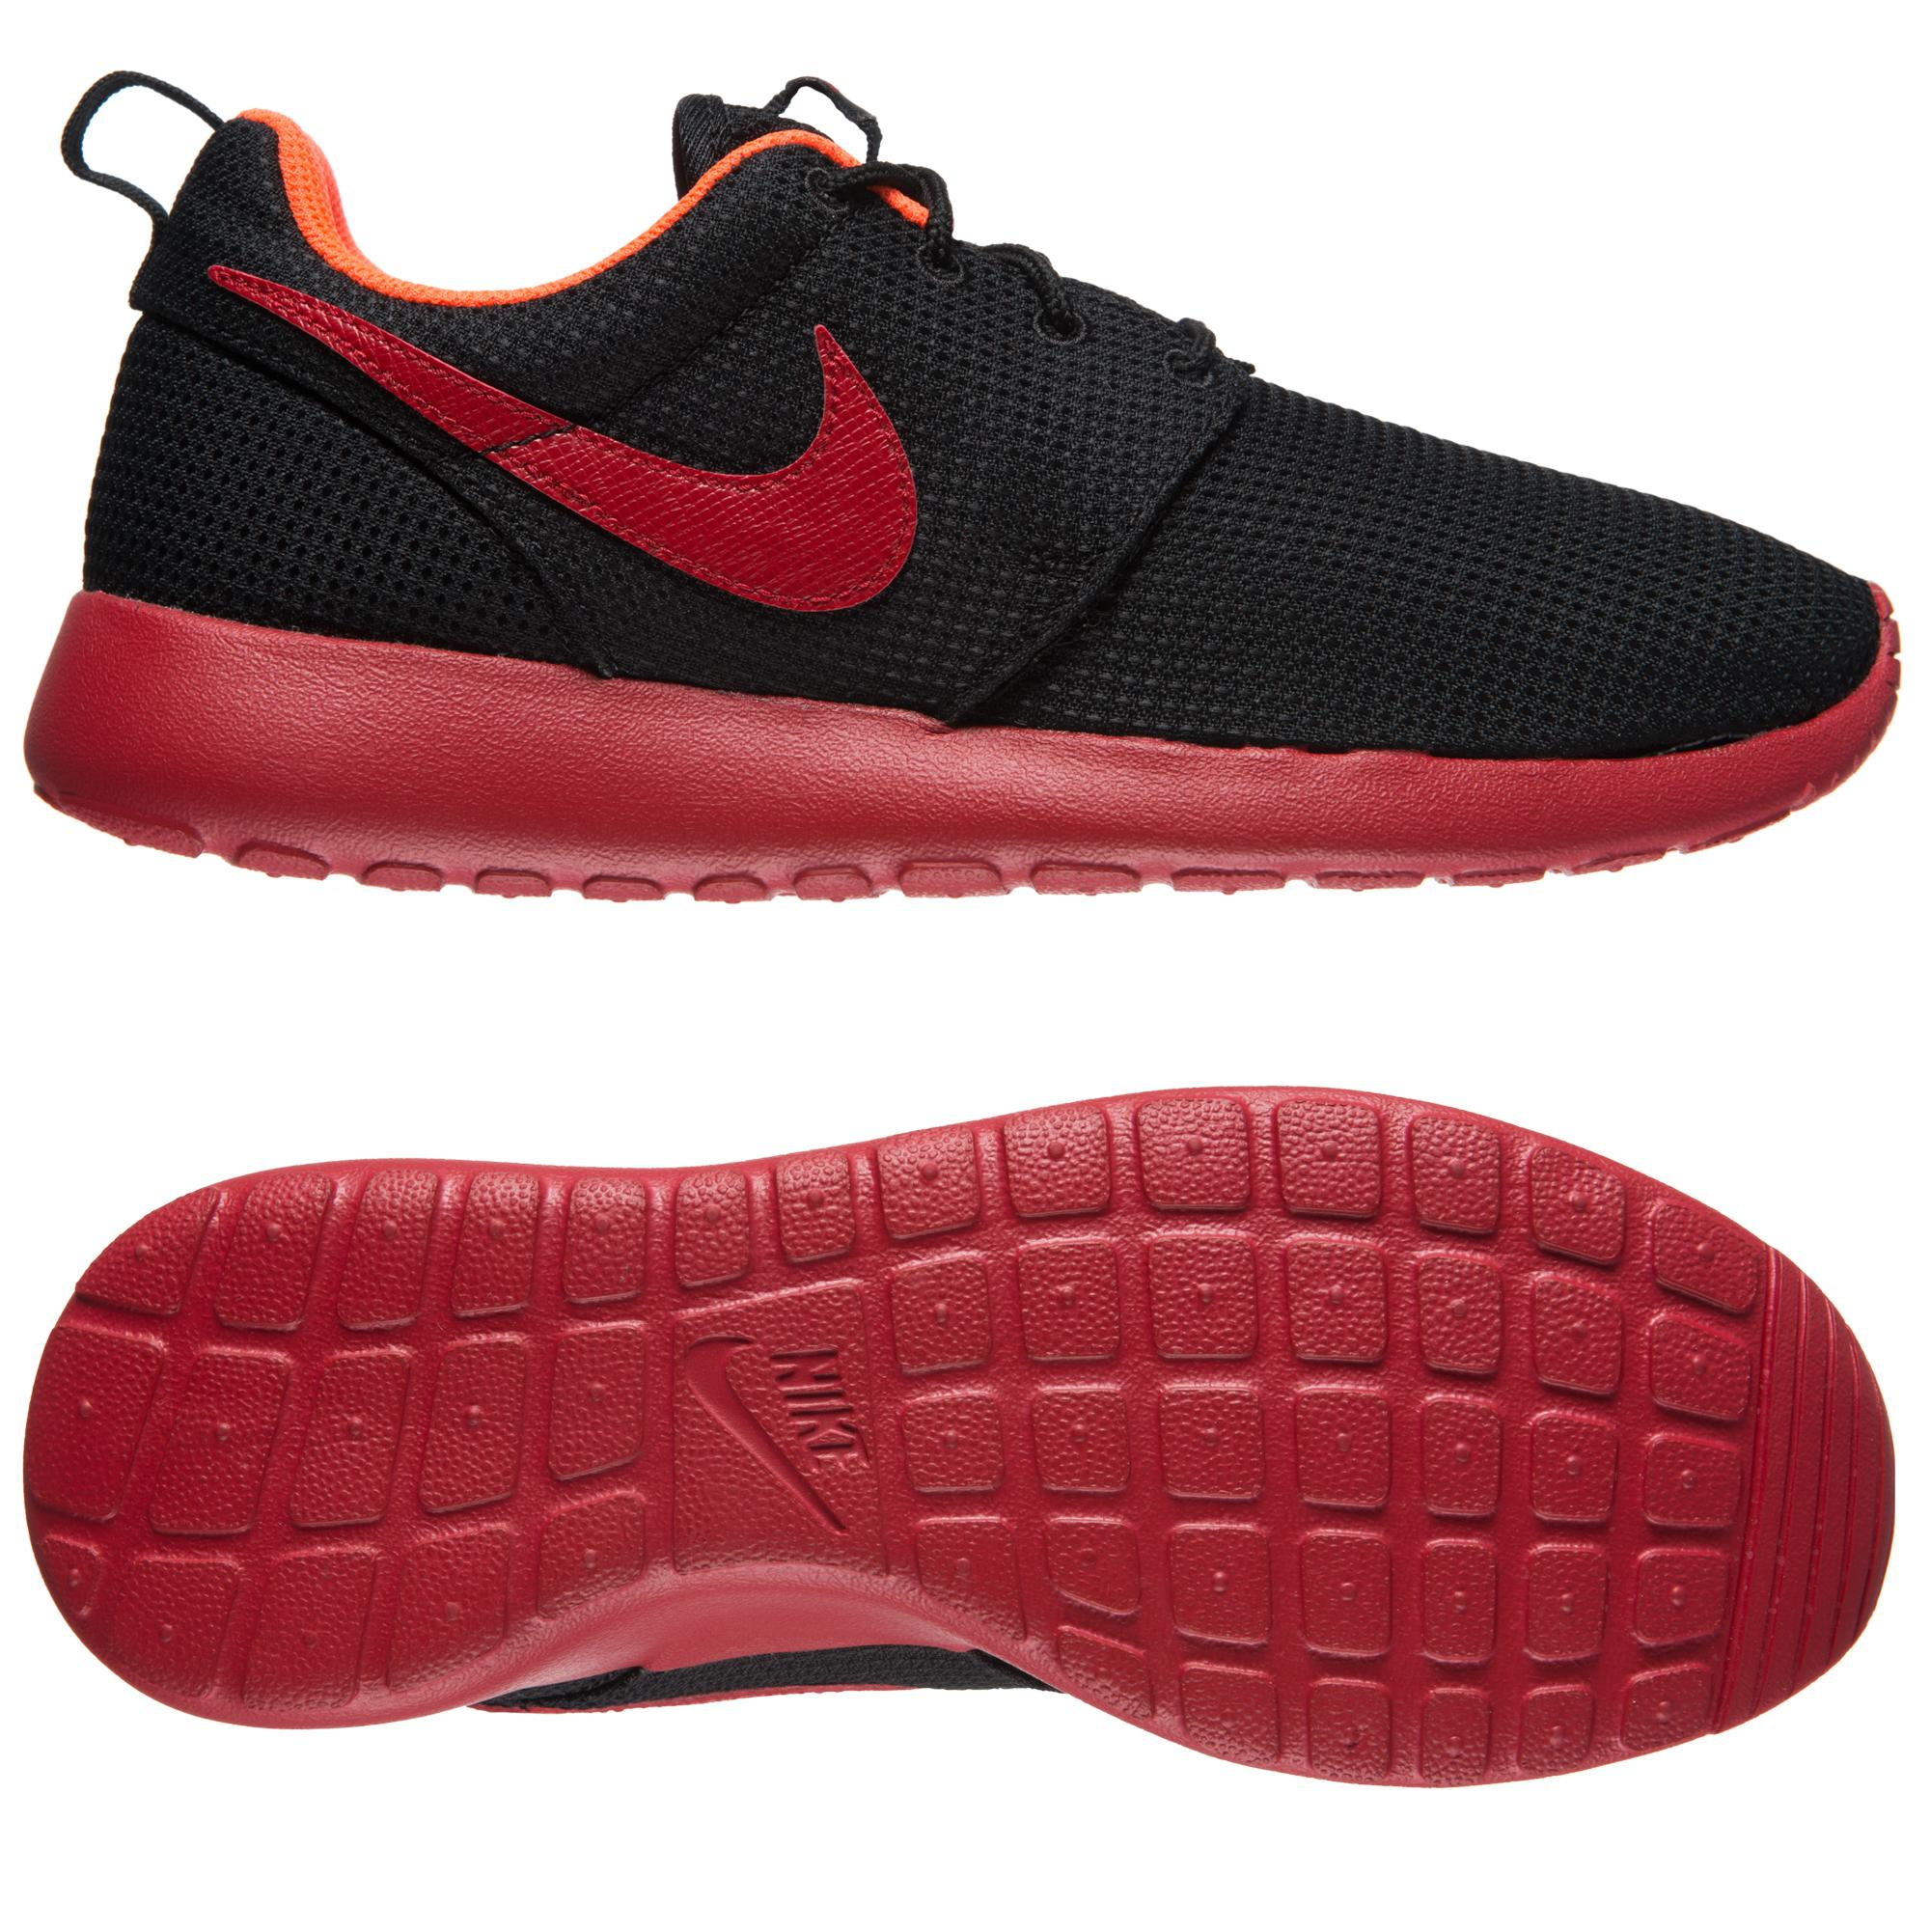 roshe run black and red